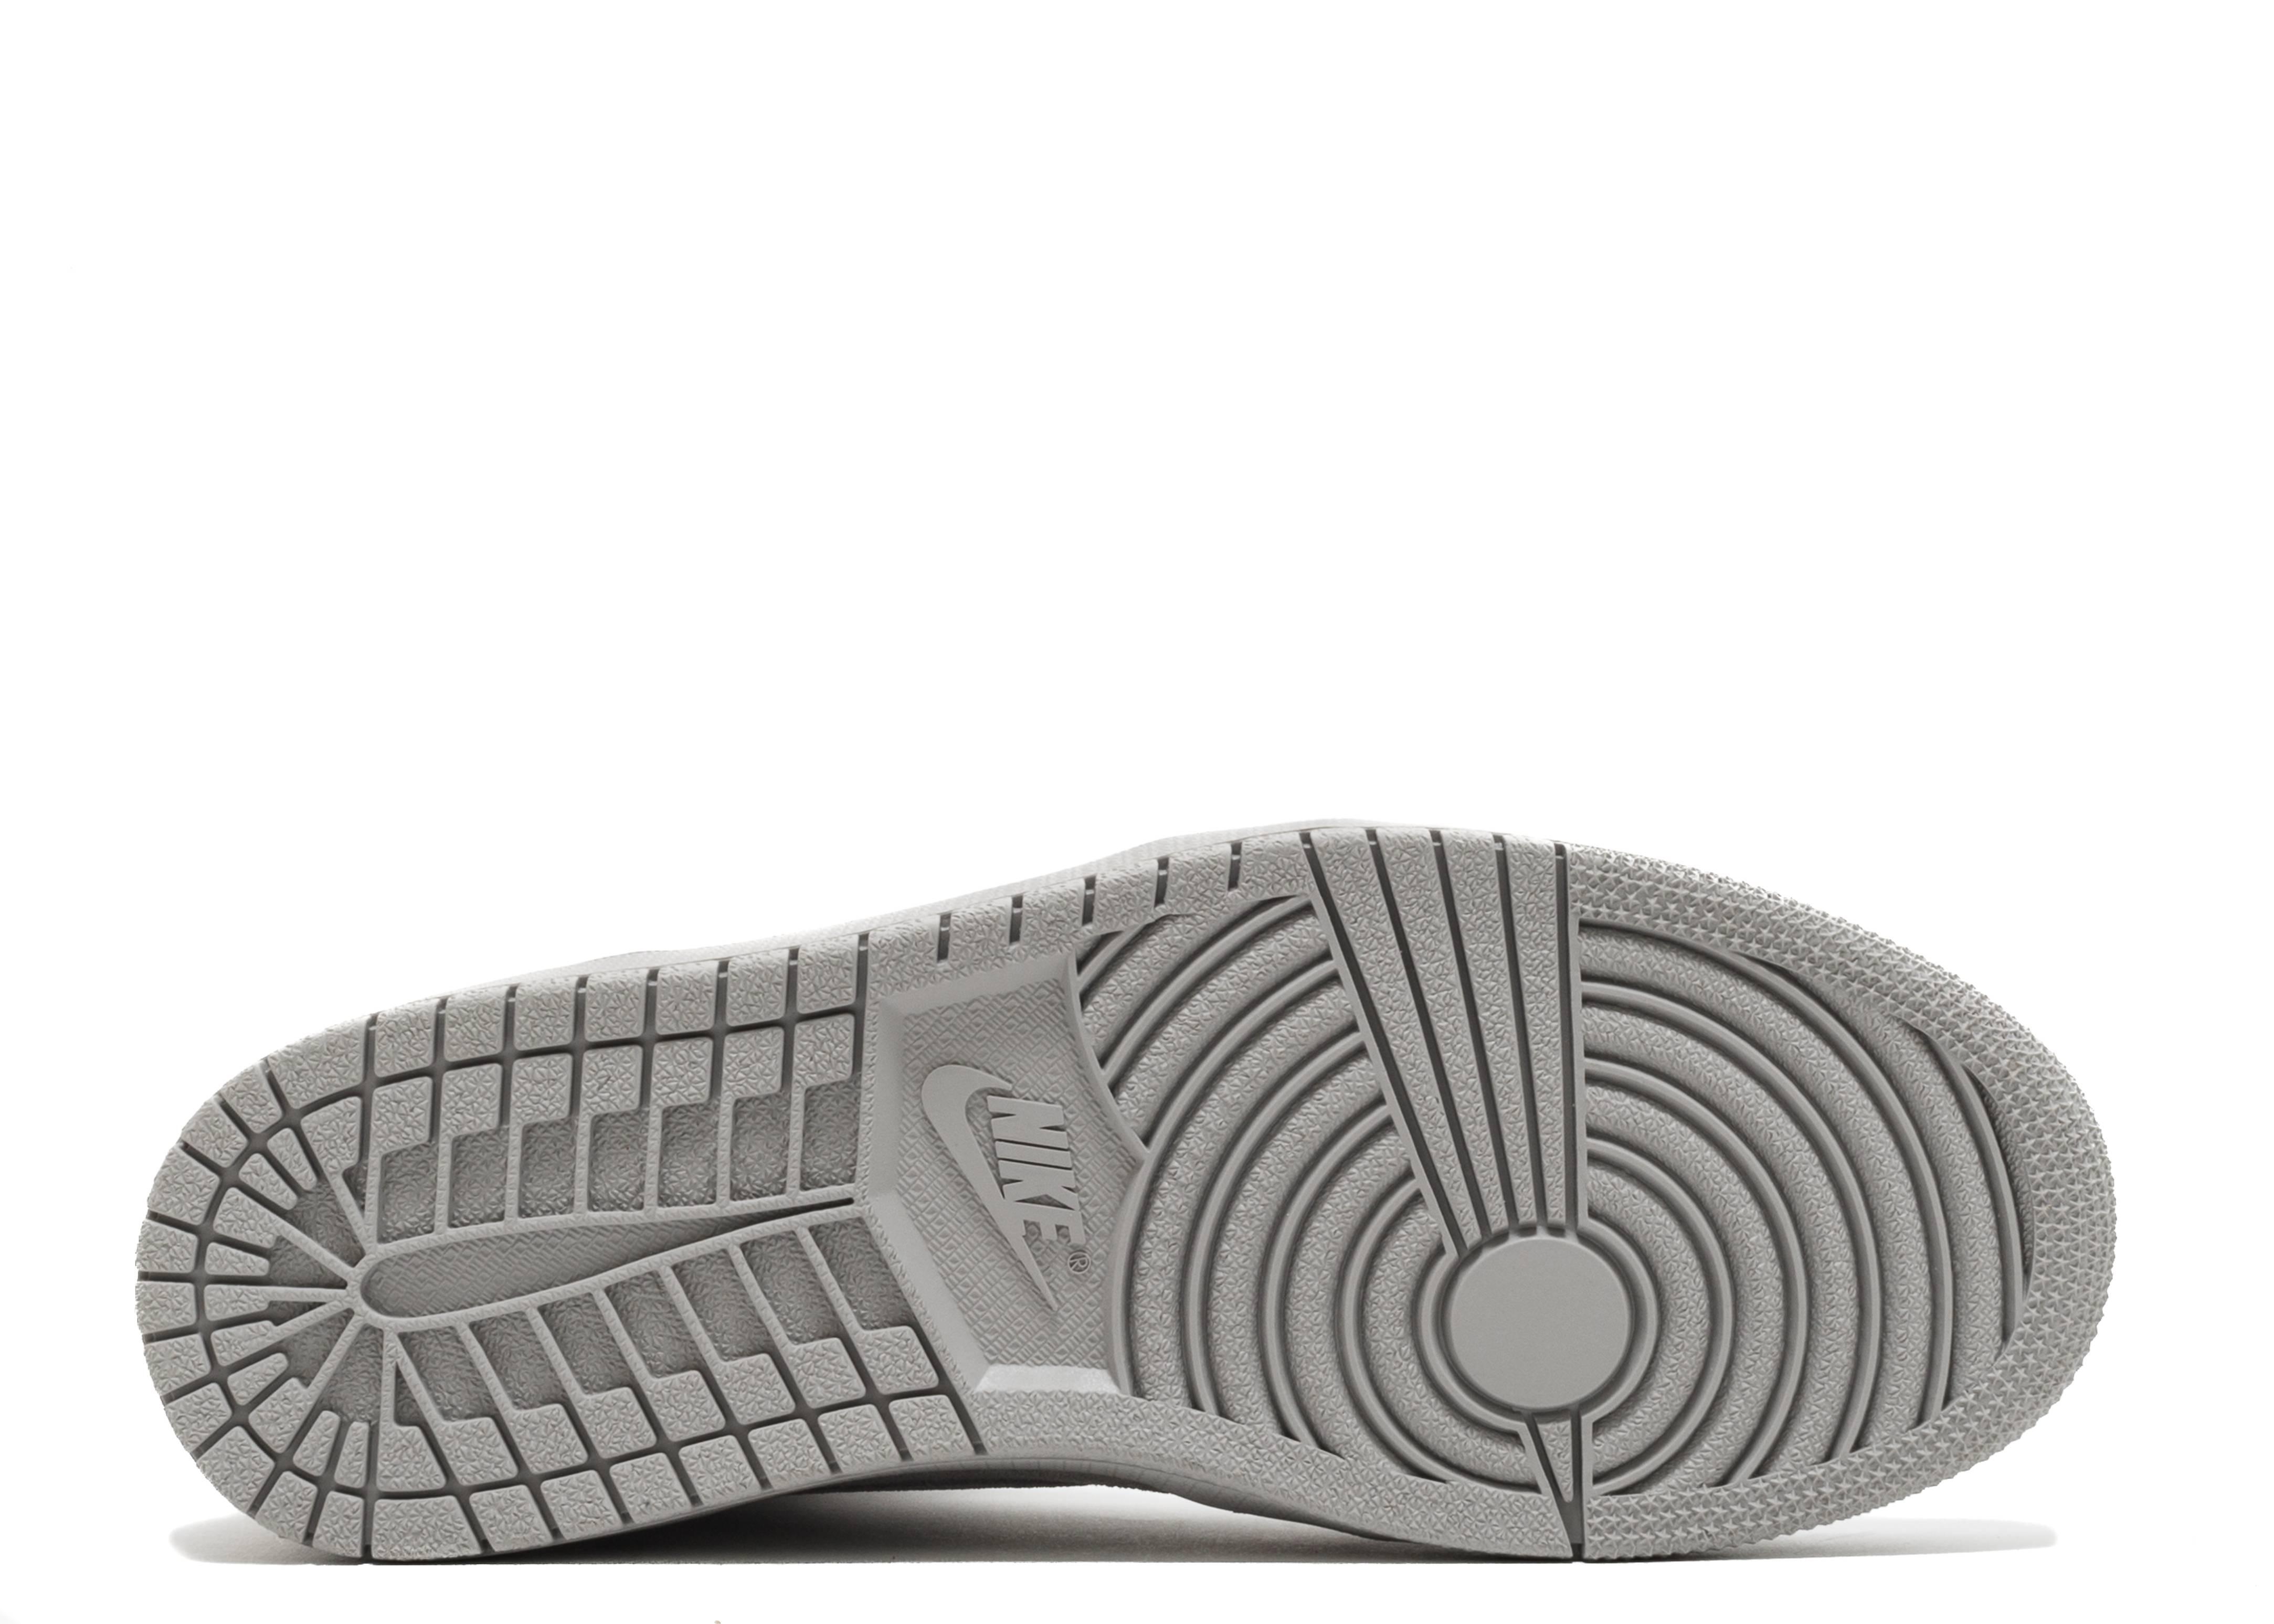 6233c31c600aab Air Jordan 1 Retro High - Air Jordan - 332550 031 - wolf grey wolf grey